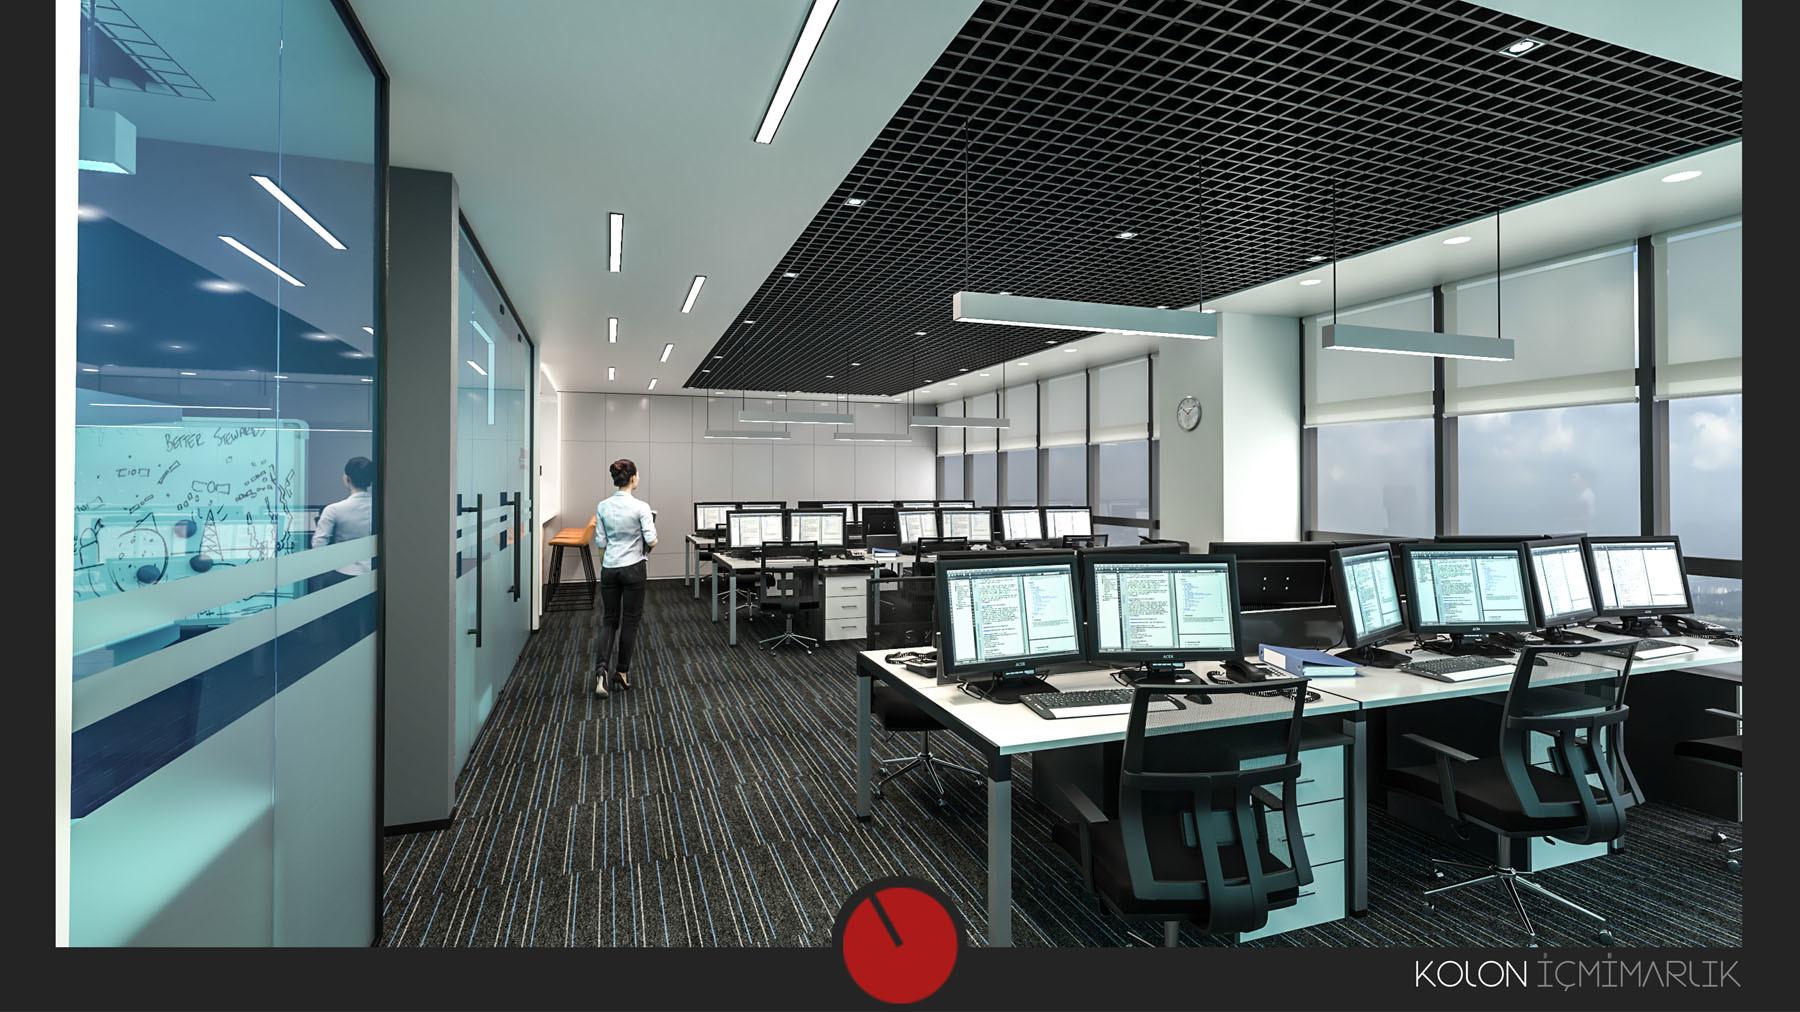 kolon-mimarlik-icmimarlik-ic-mimarliktasarimi-icmimari-tasarimi-ofis-tasarimi-ofis-tasarimlar-ic mimar istanbul